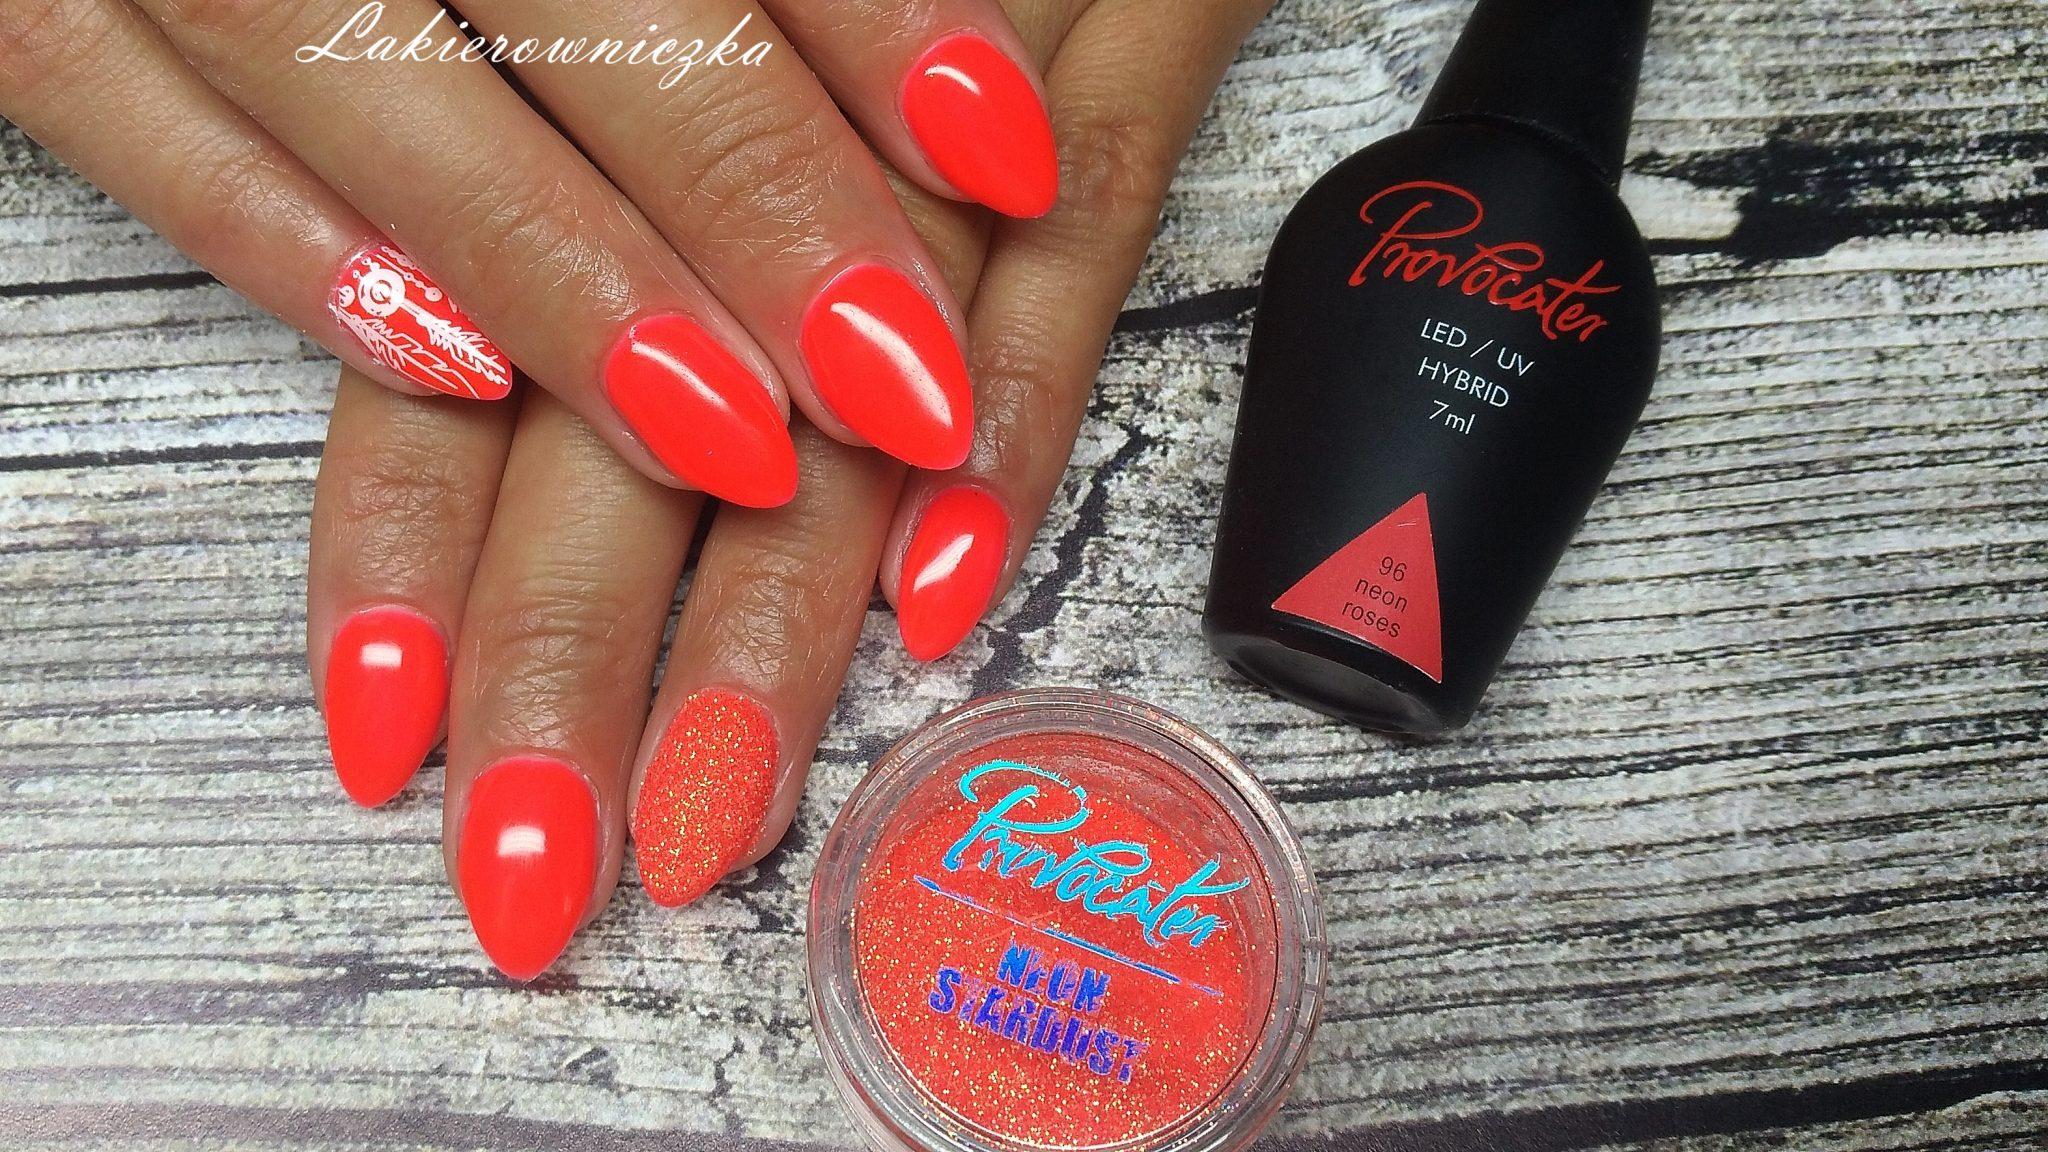 neon-orange-stamps-plates-bps-provocater-neon-strdust-paznokcie-pomaranczowe-neonowe